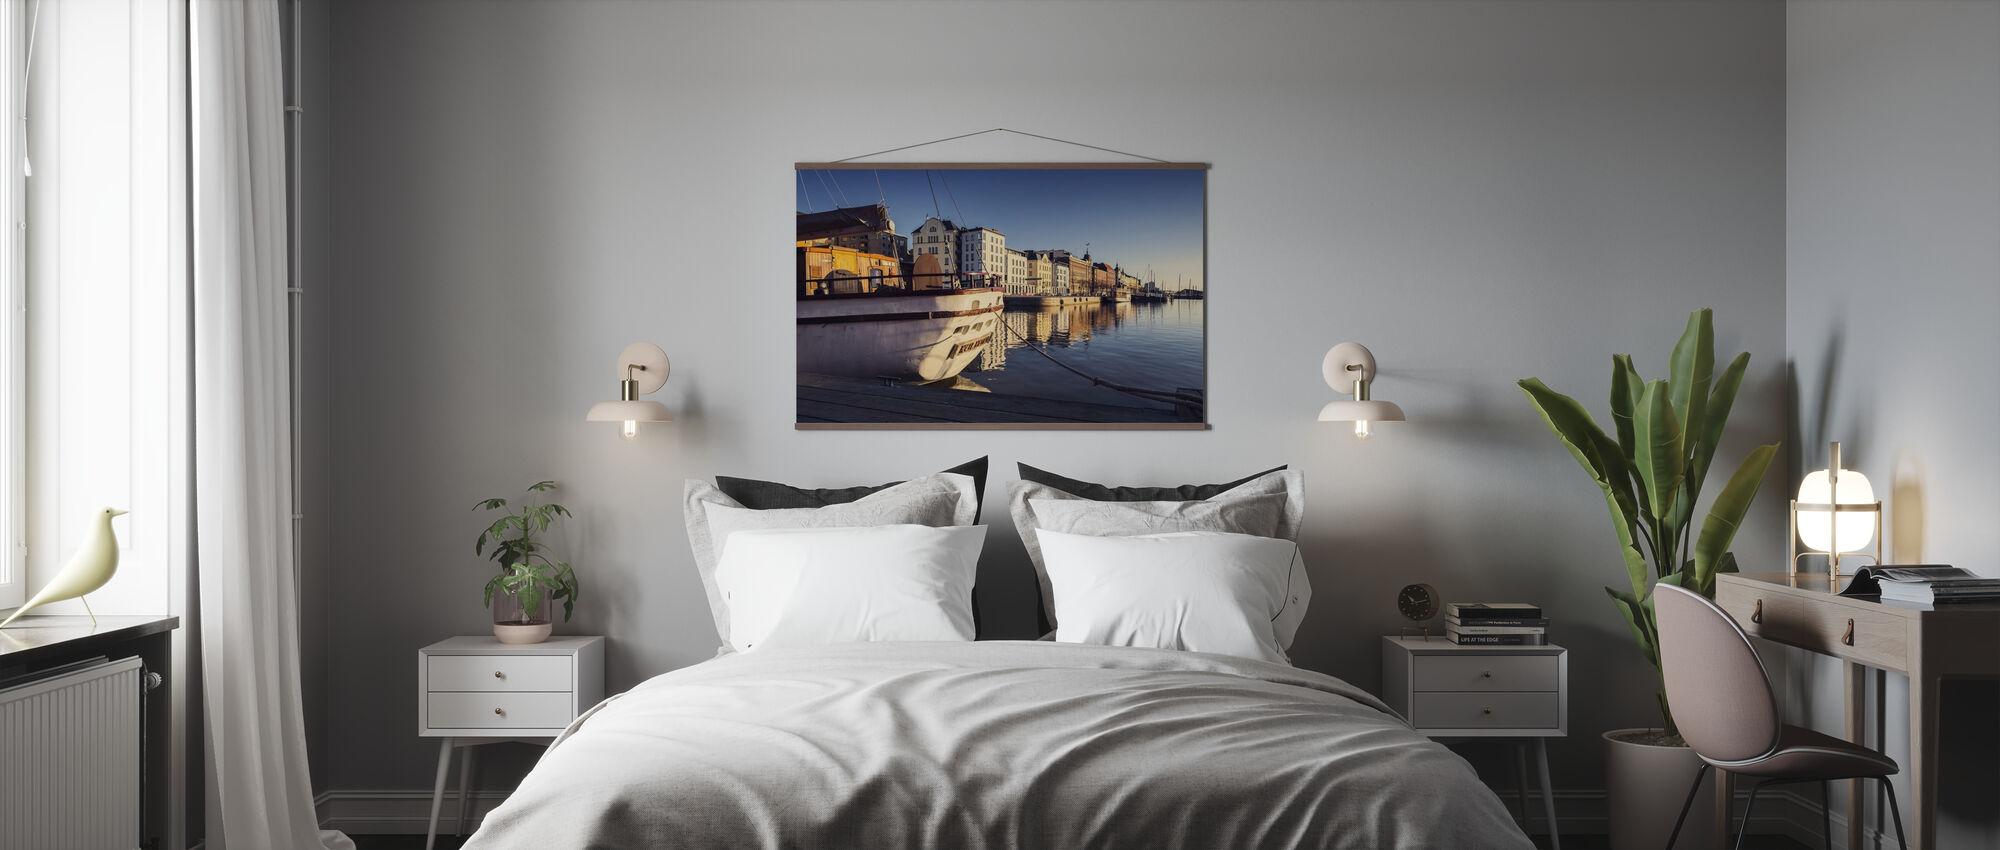 Old Harbor - Poster - Bedroom